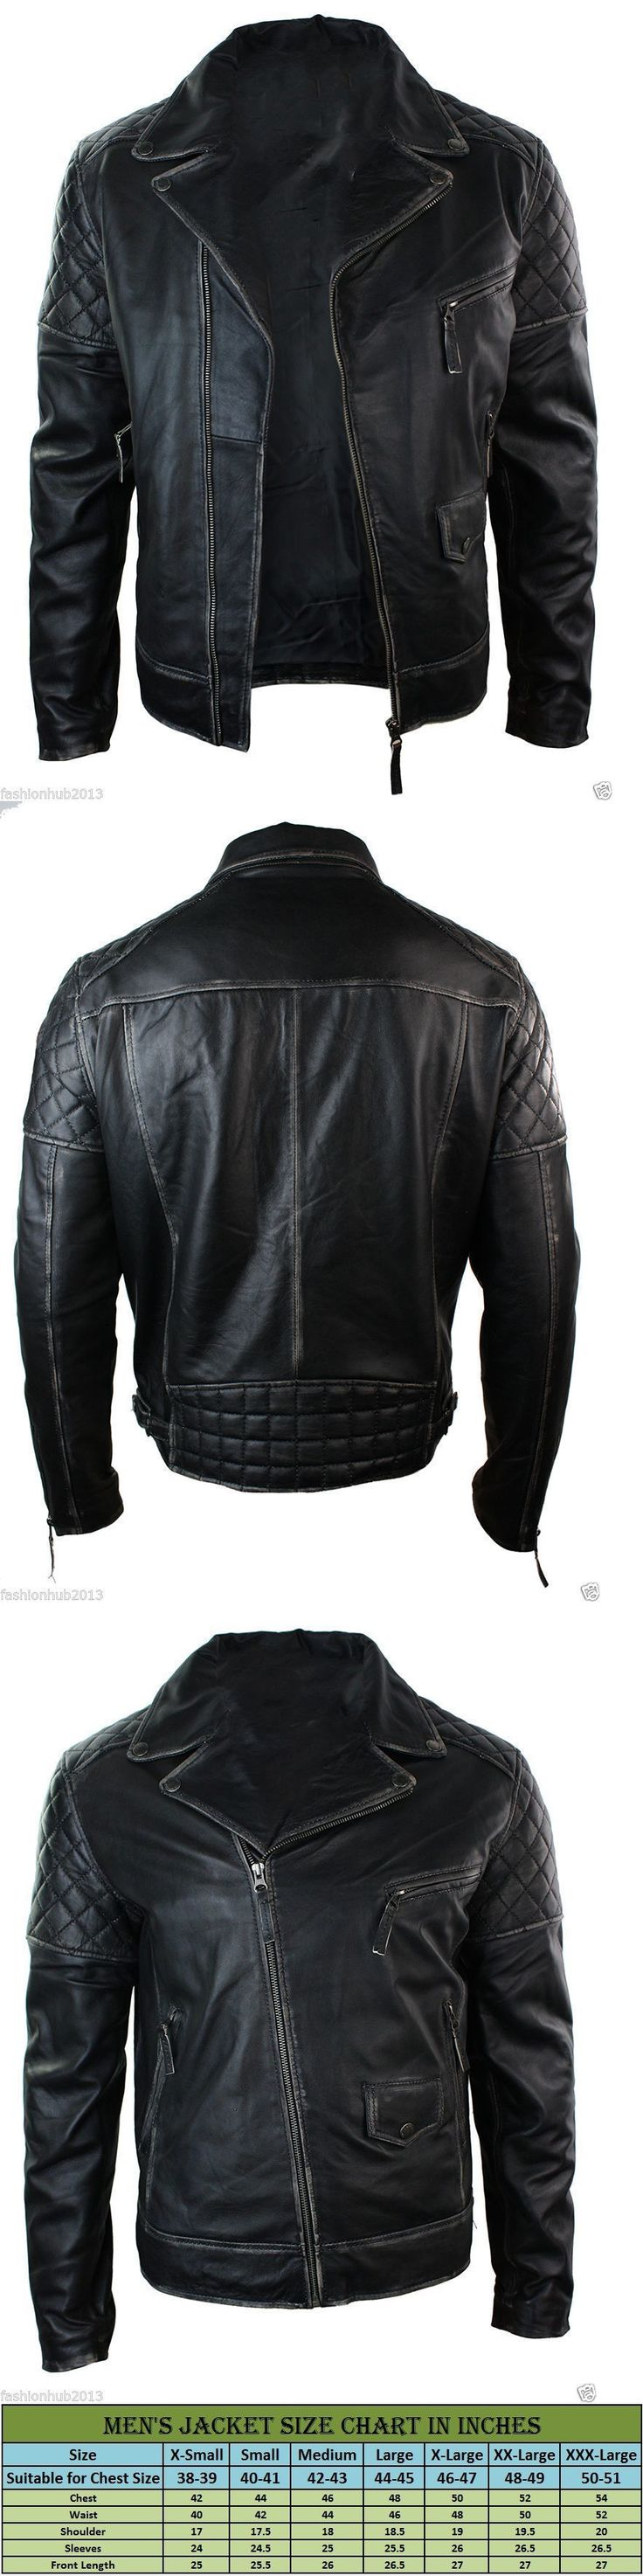 Men Coats And Jackets: New Mens Leather Jacket Slim Fit Biker Motorcycle Genuine Lambskin Coat #1308 -> BUY IT NOW ONLY: $149.99 on eBay!